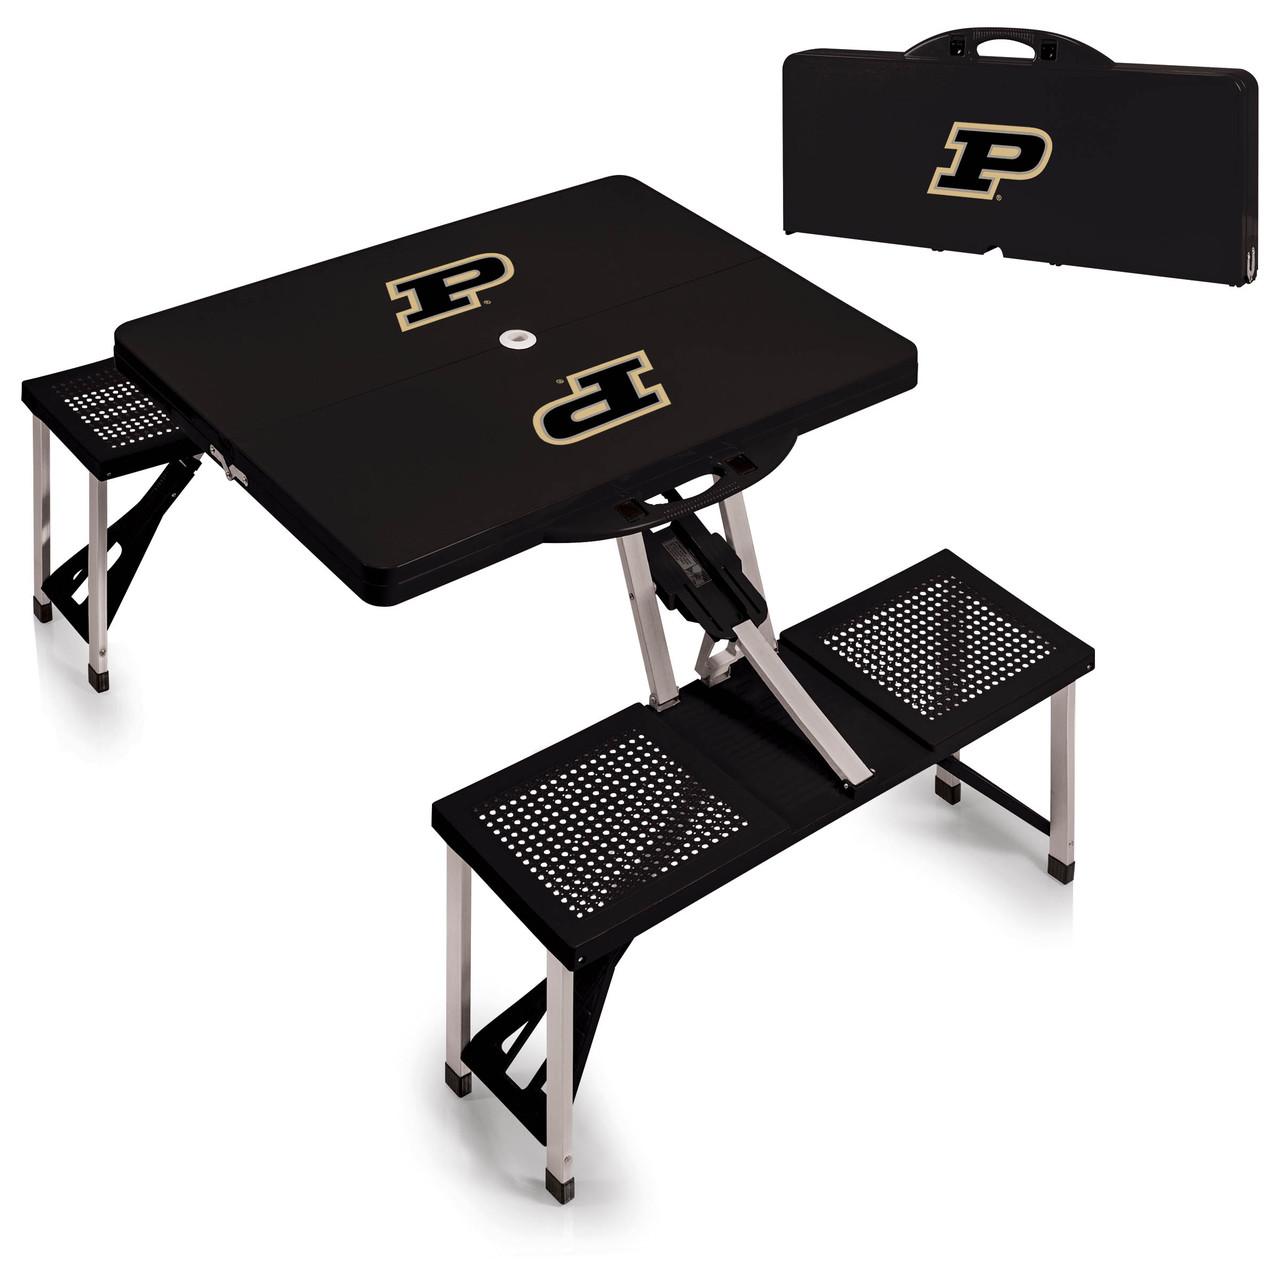 Picnic Table - Purdue University